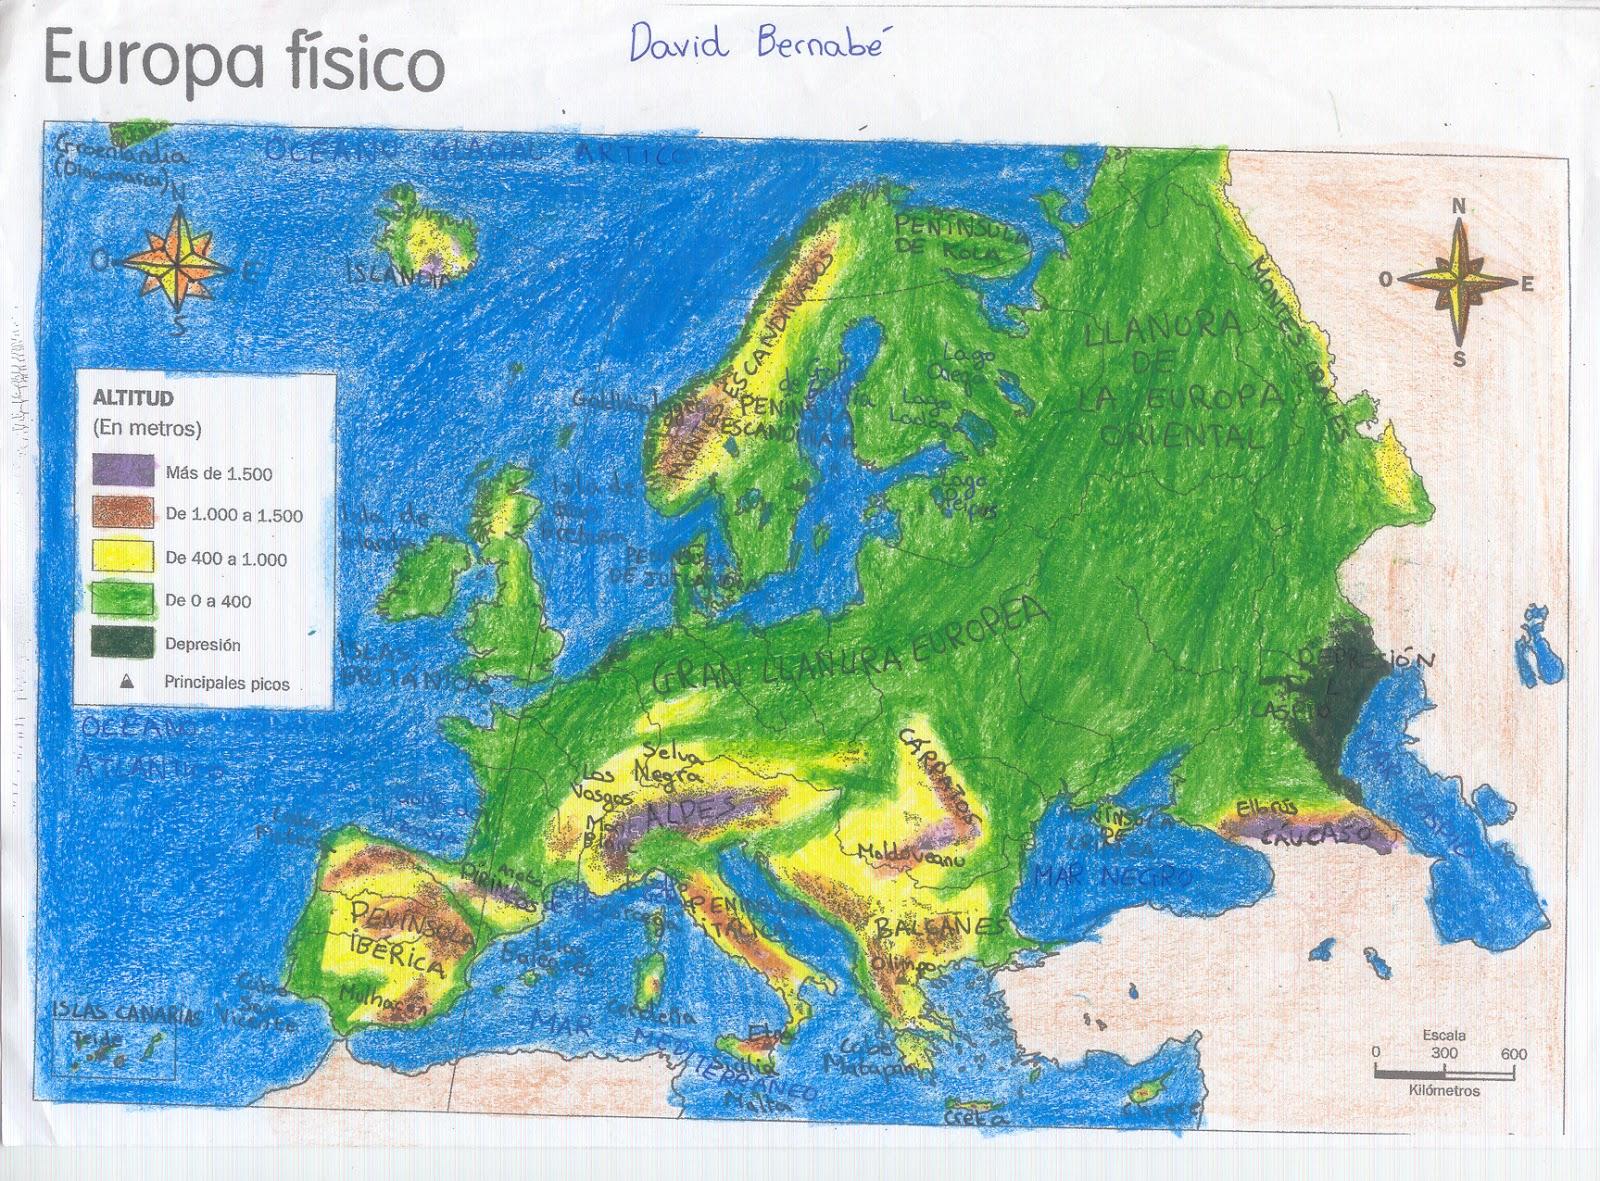 Mi profe dice que estudie MAPAS DE EUROPA